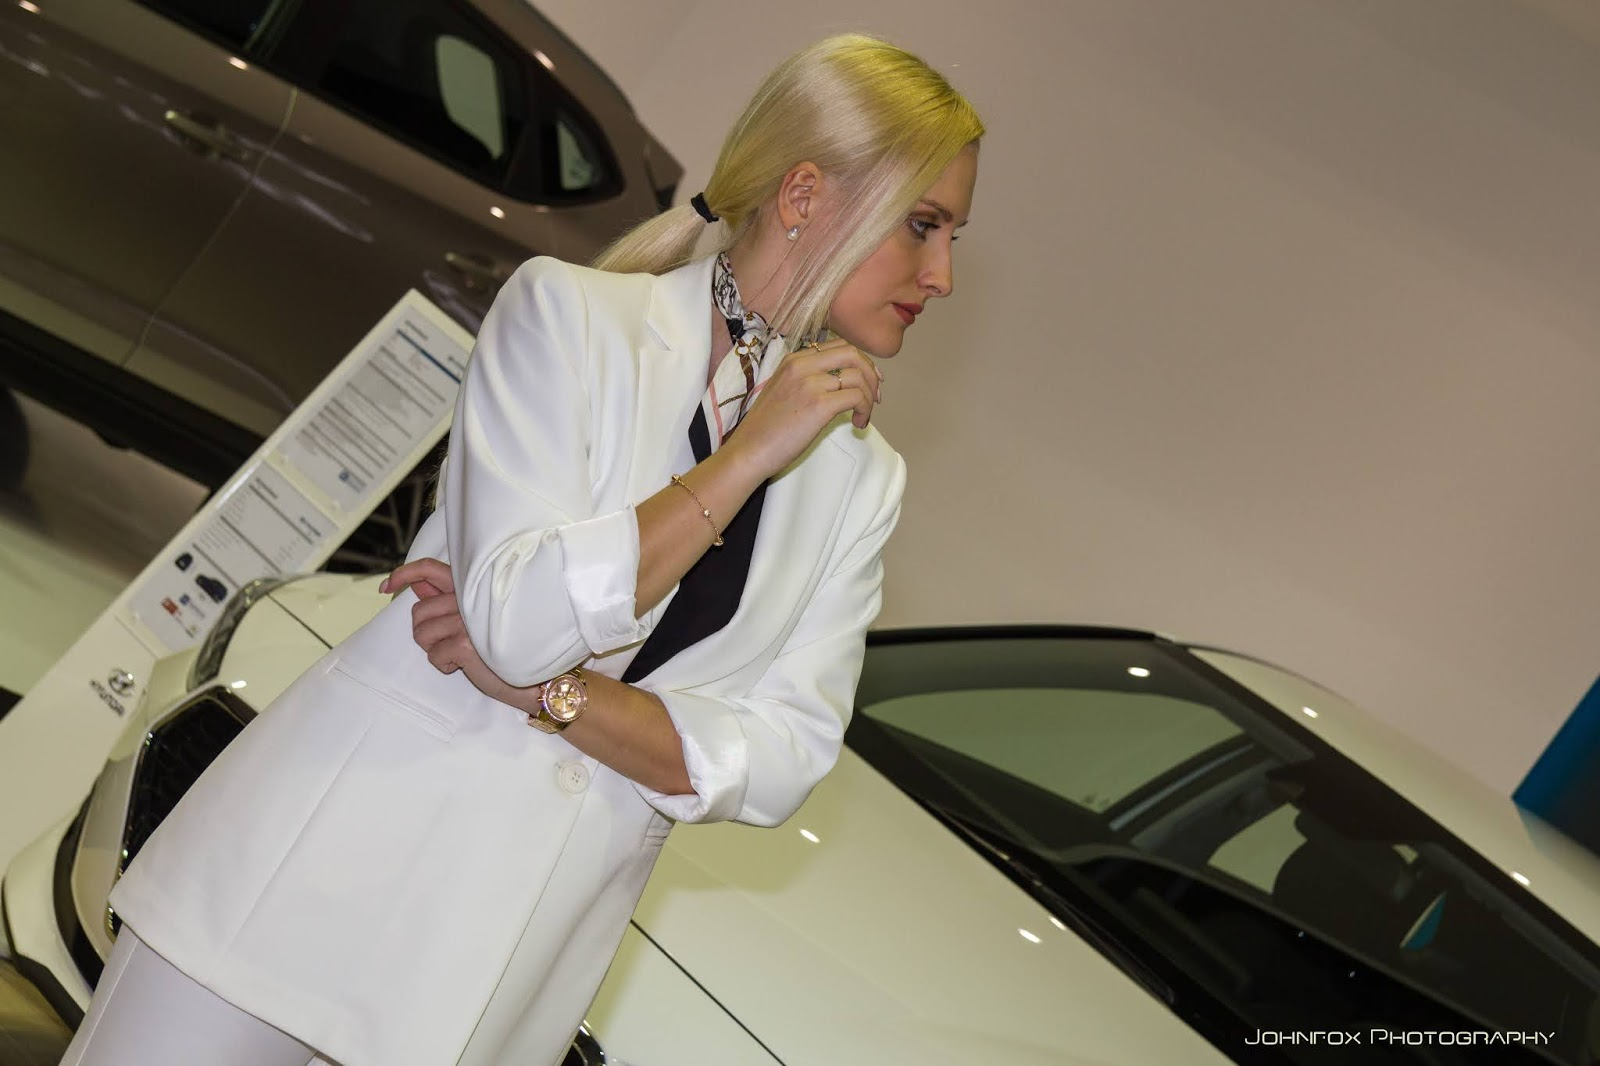 models2B2528182Bof2B232529 Τα κορίτσια της Αυτοκίνησης! Έκθεση, μοντέλα, ΦΩΤΟ, φωτογραφίες